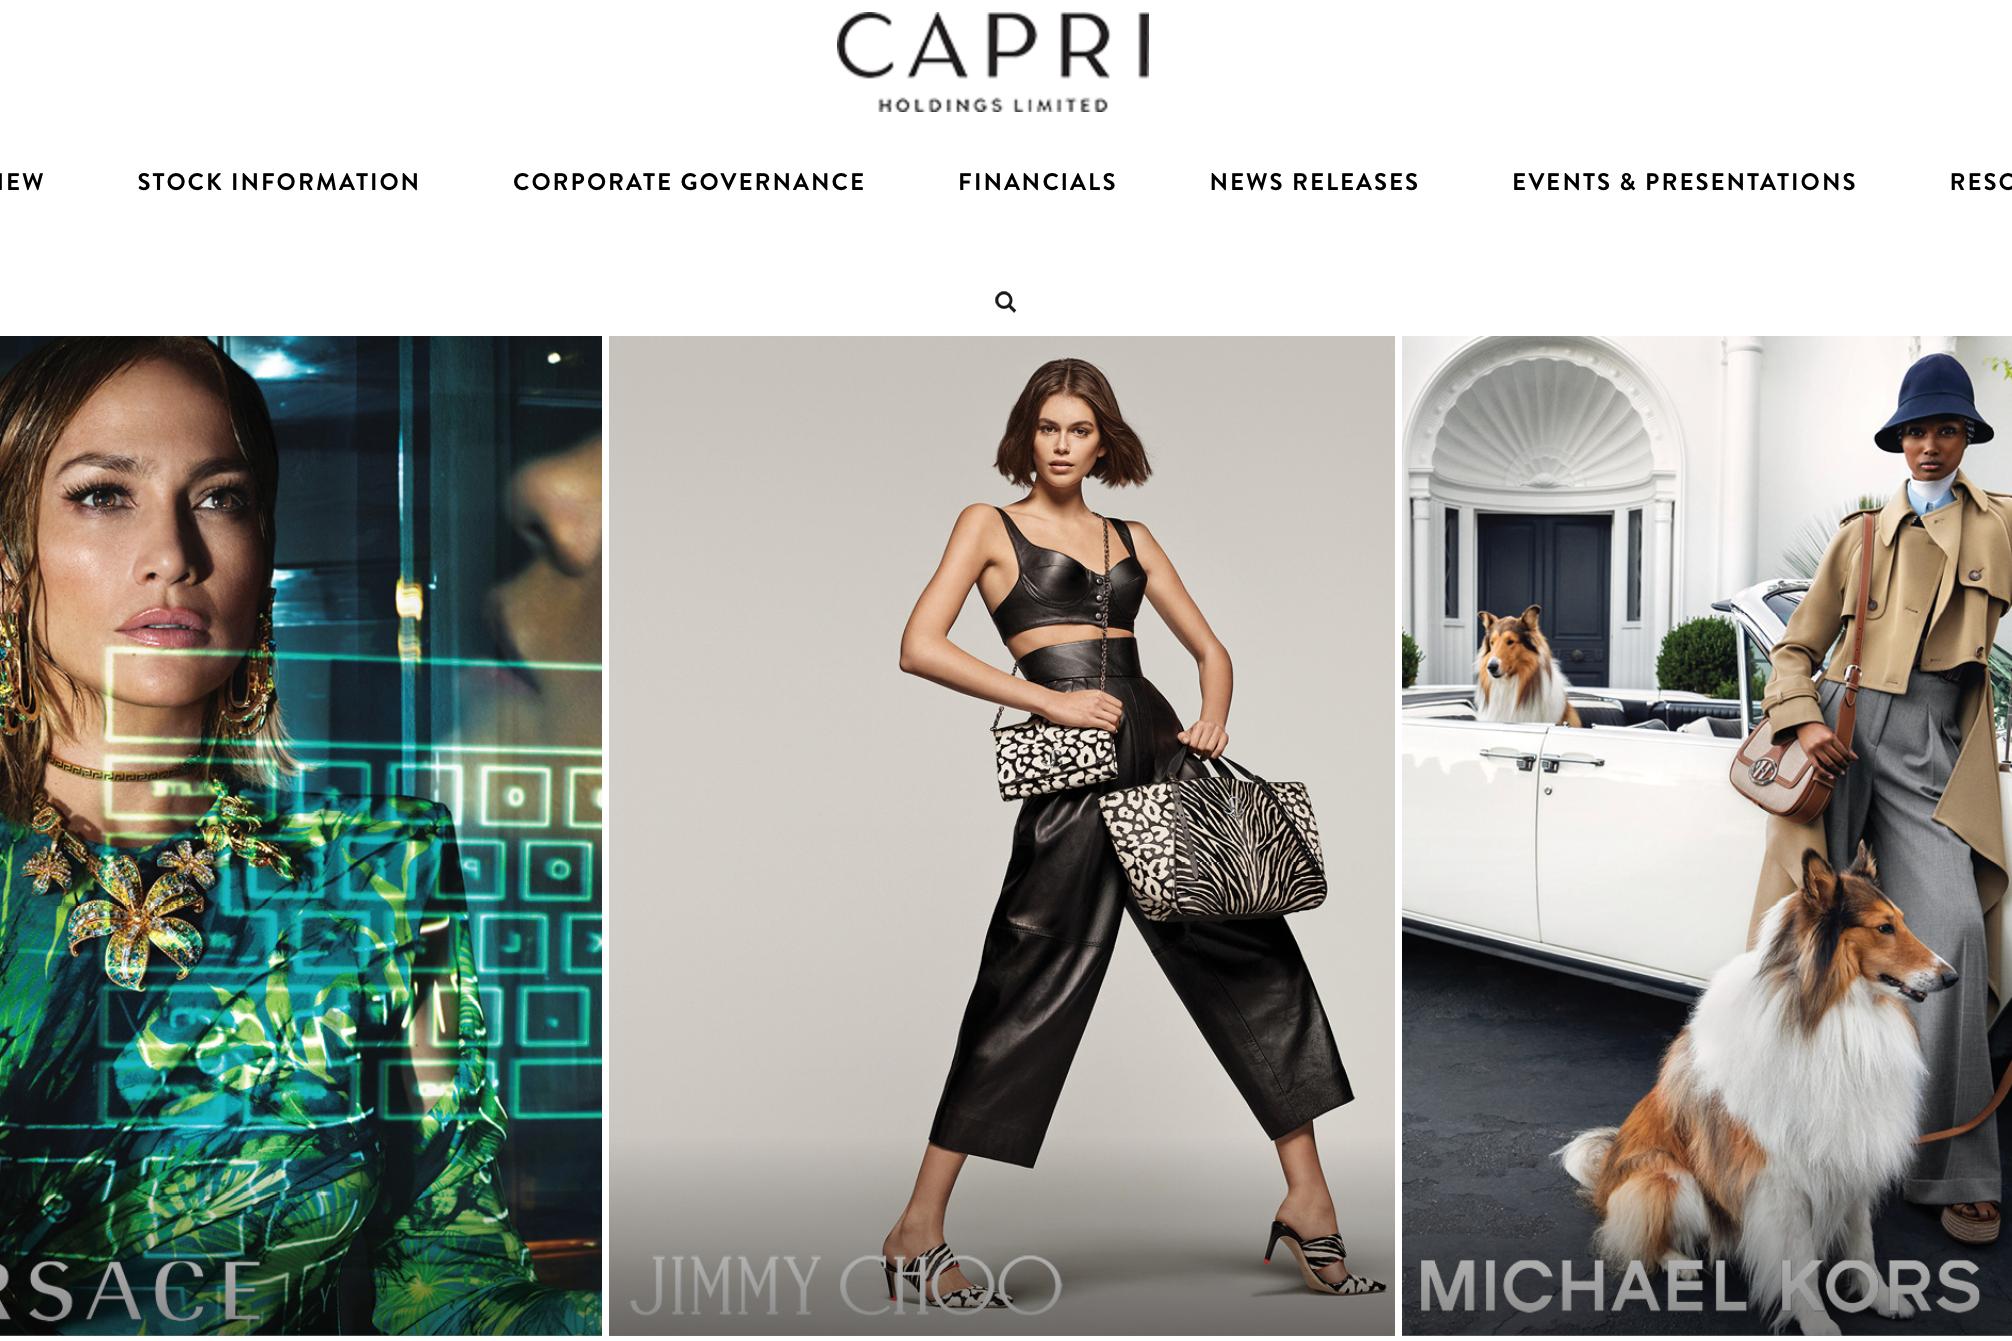 Capri集团、Ralph Lauren 和 A&F 等美国时尚集团纷纷实施减薪和停薪休假